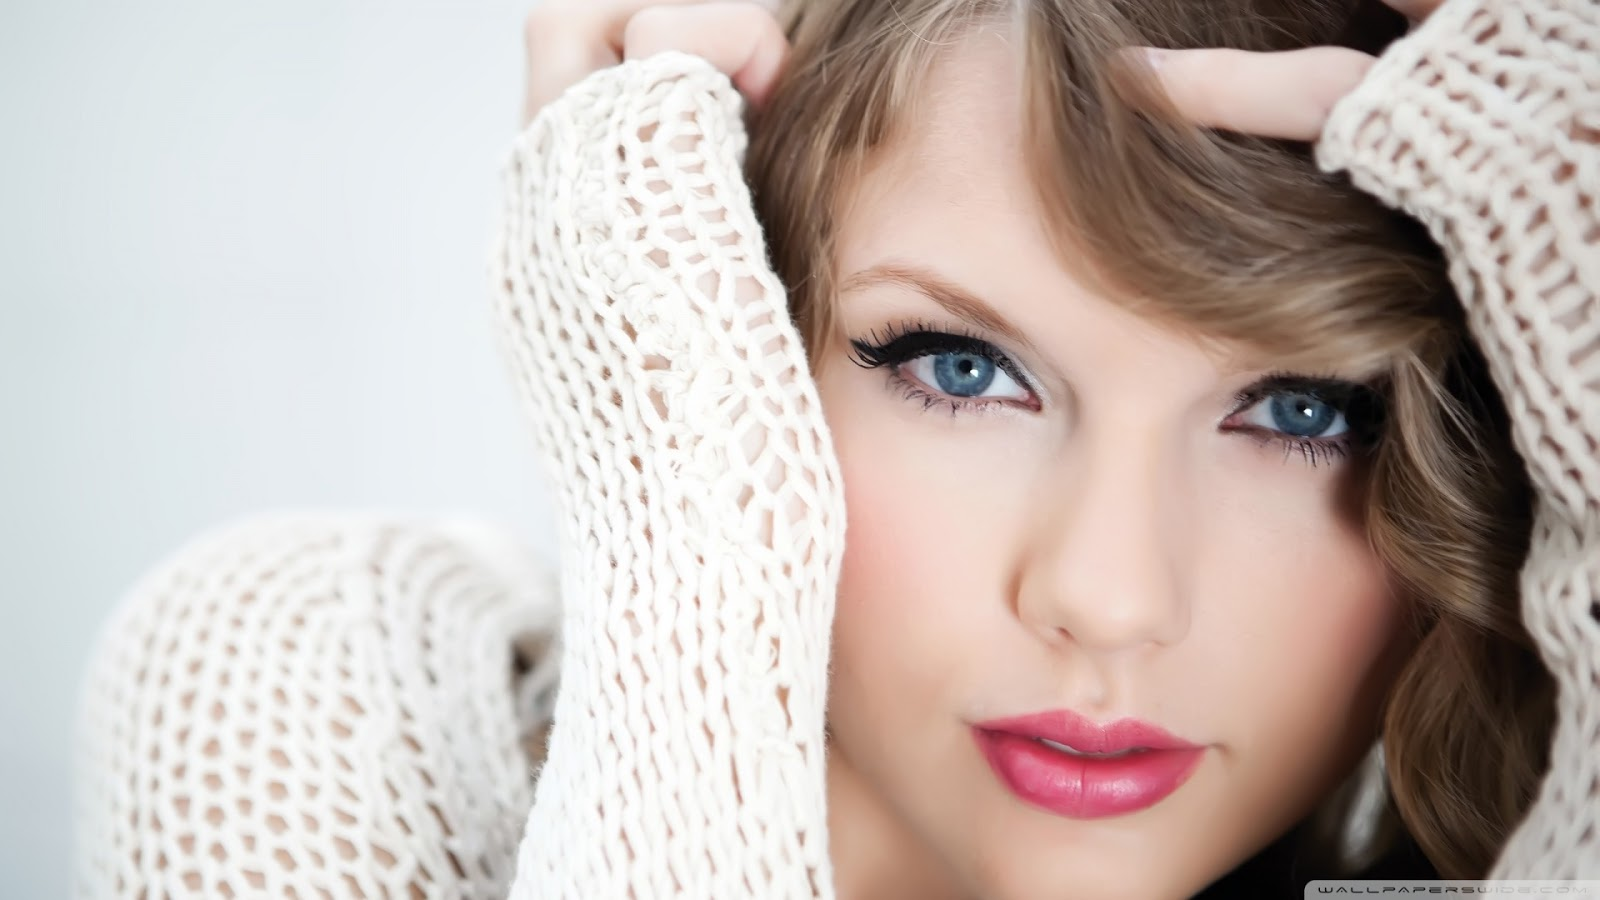 Taylor Swift Close Up Wallpaper